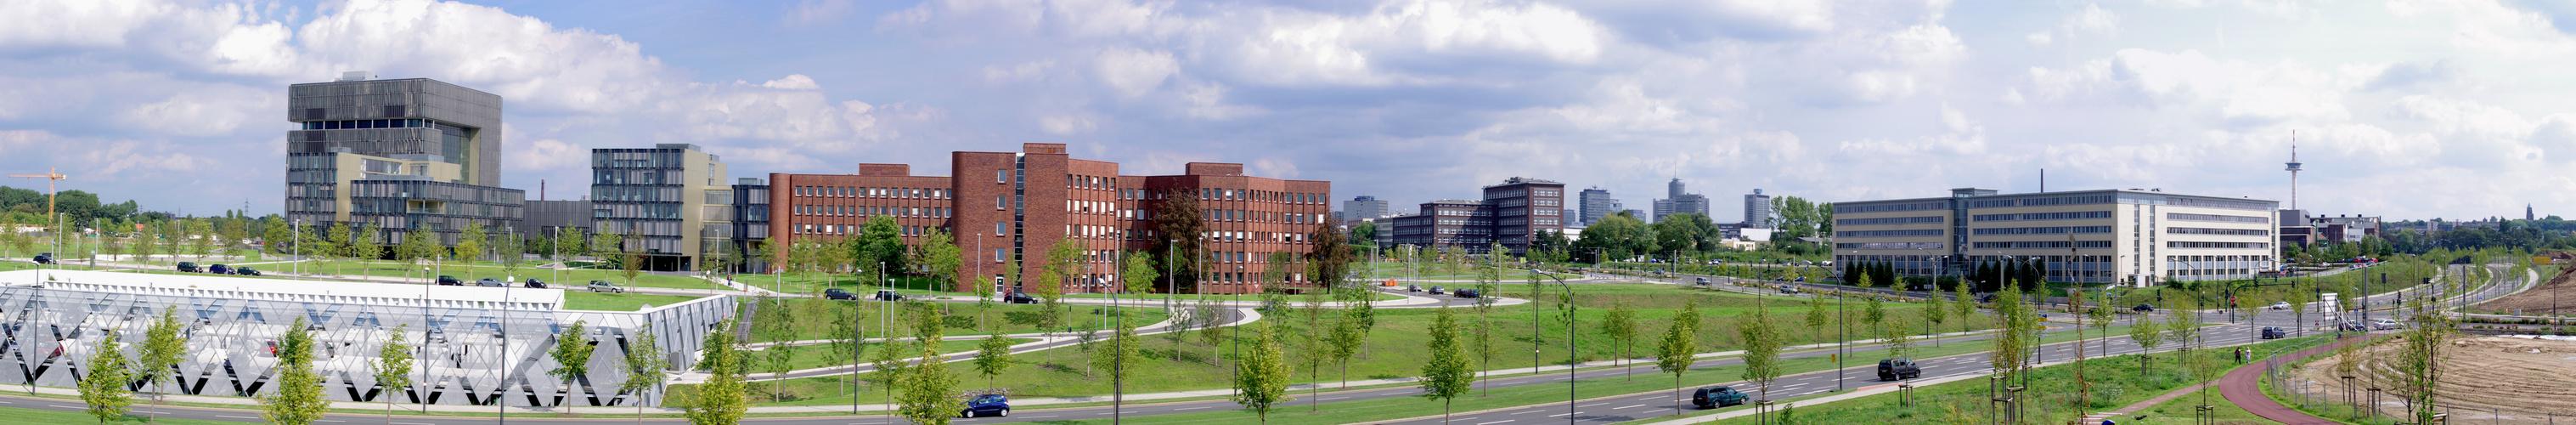 Krupp Quartier in Essen (2)